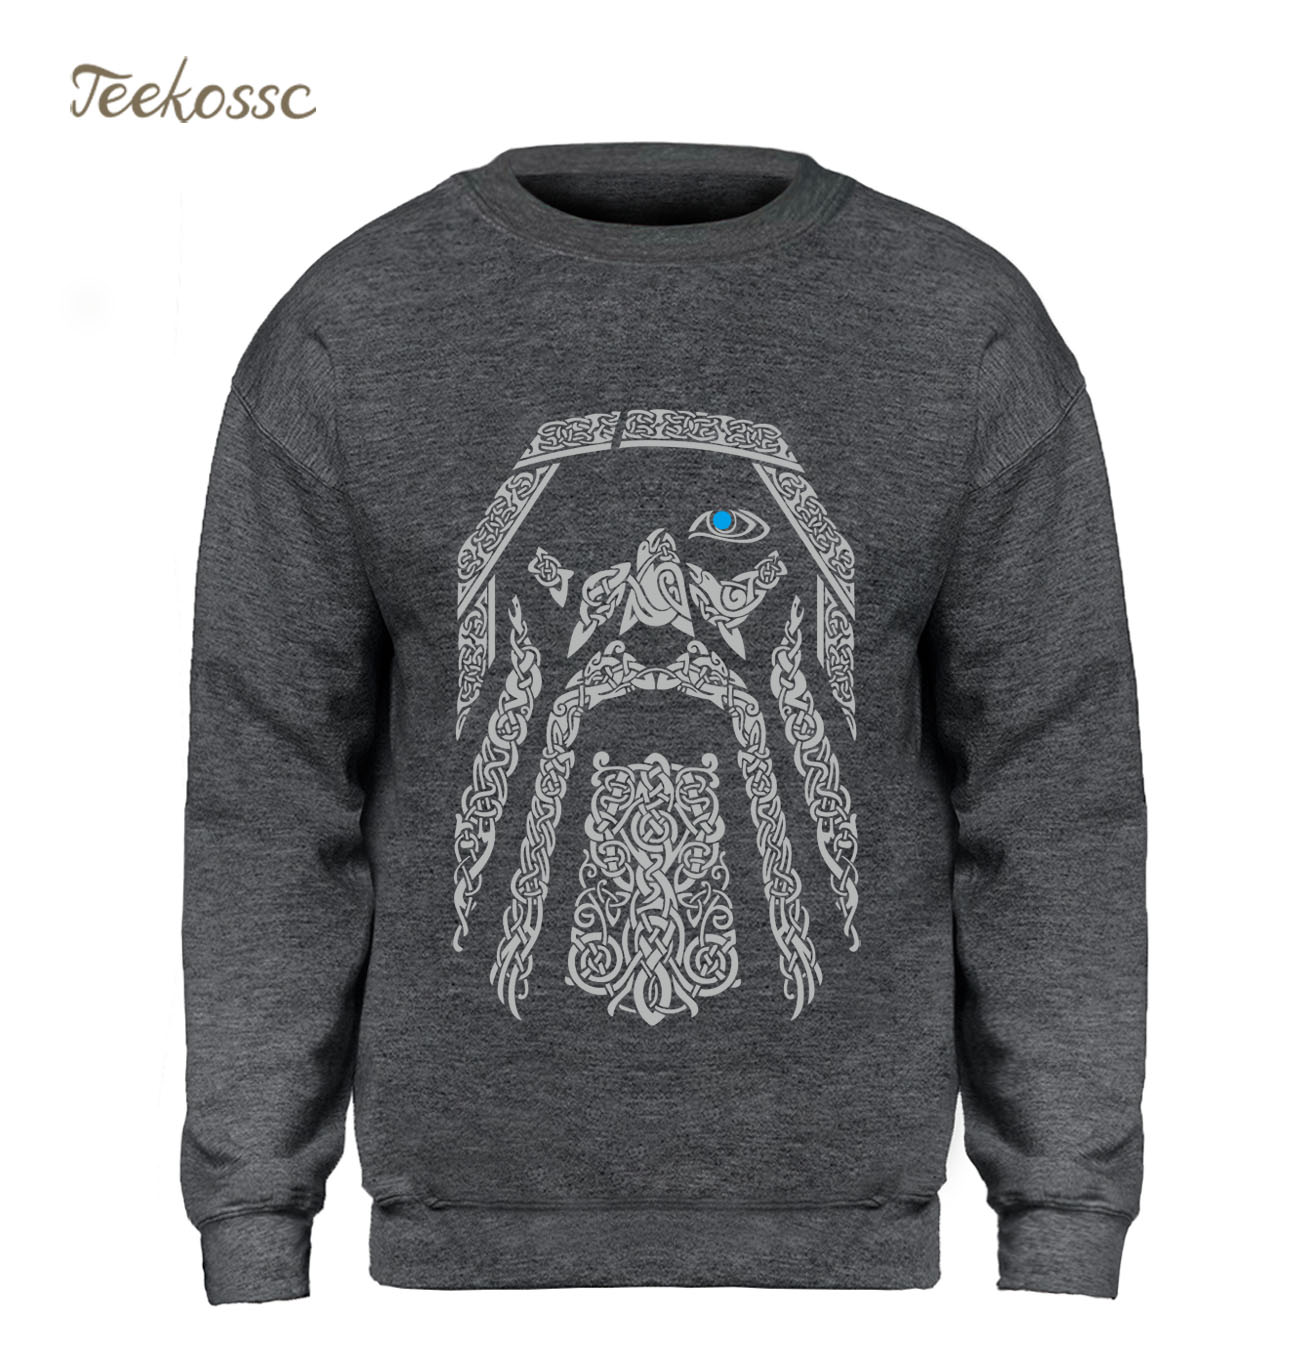 Odin Vikings Vintage Hoodie Men Sweatshirt Crewneck Sweatshirts 2018 Winter Autumn Fleece Warm Father